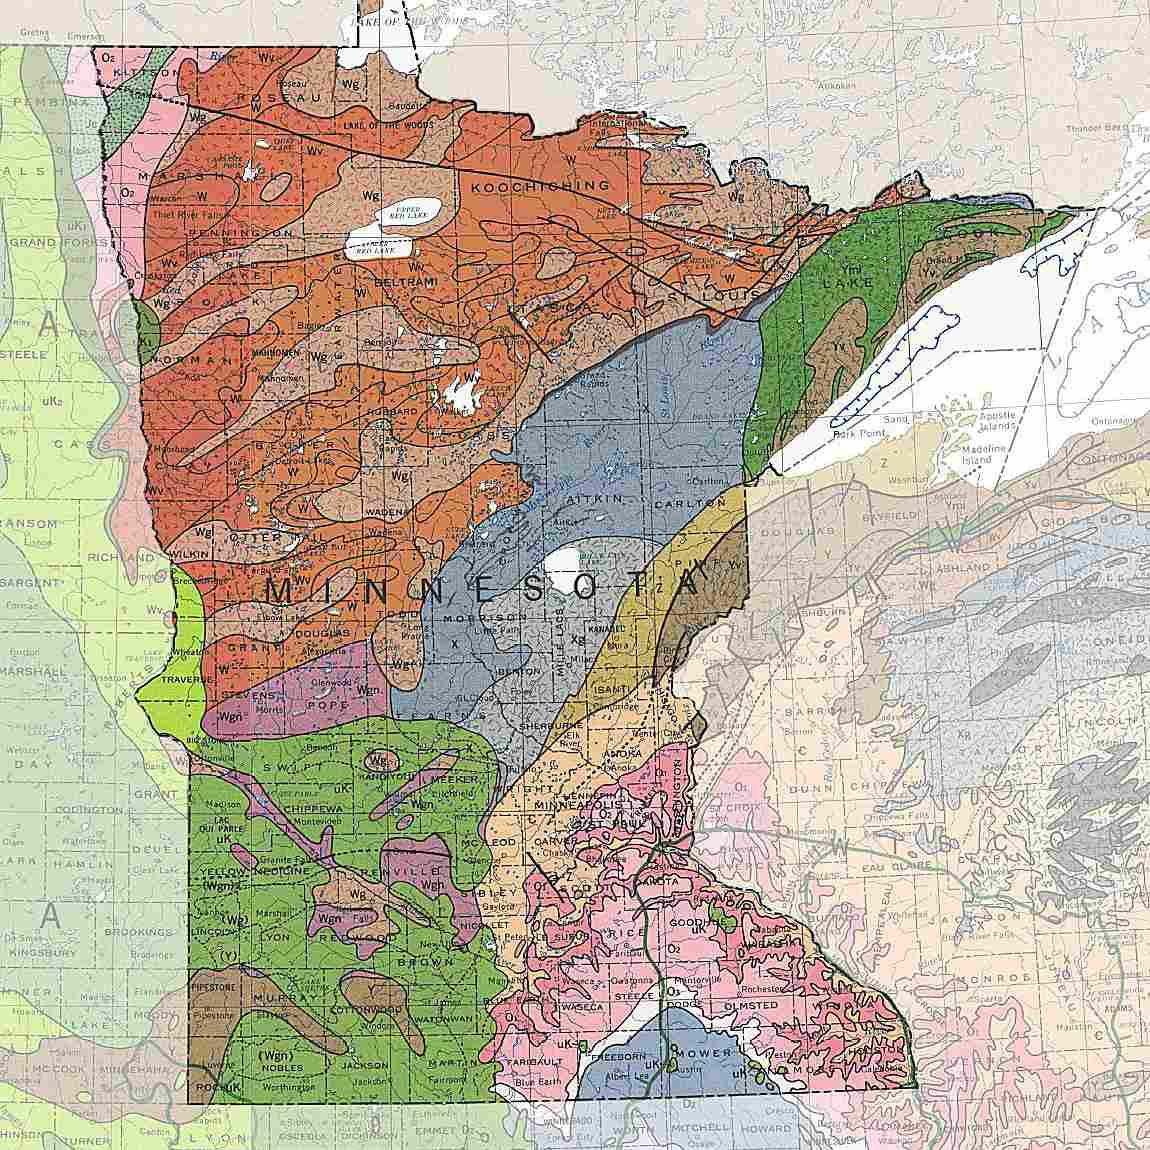 A Map of Minnesota's geology and rocks